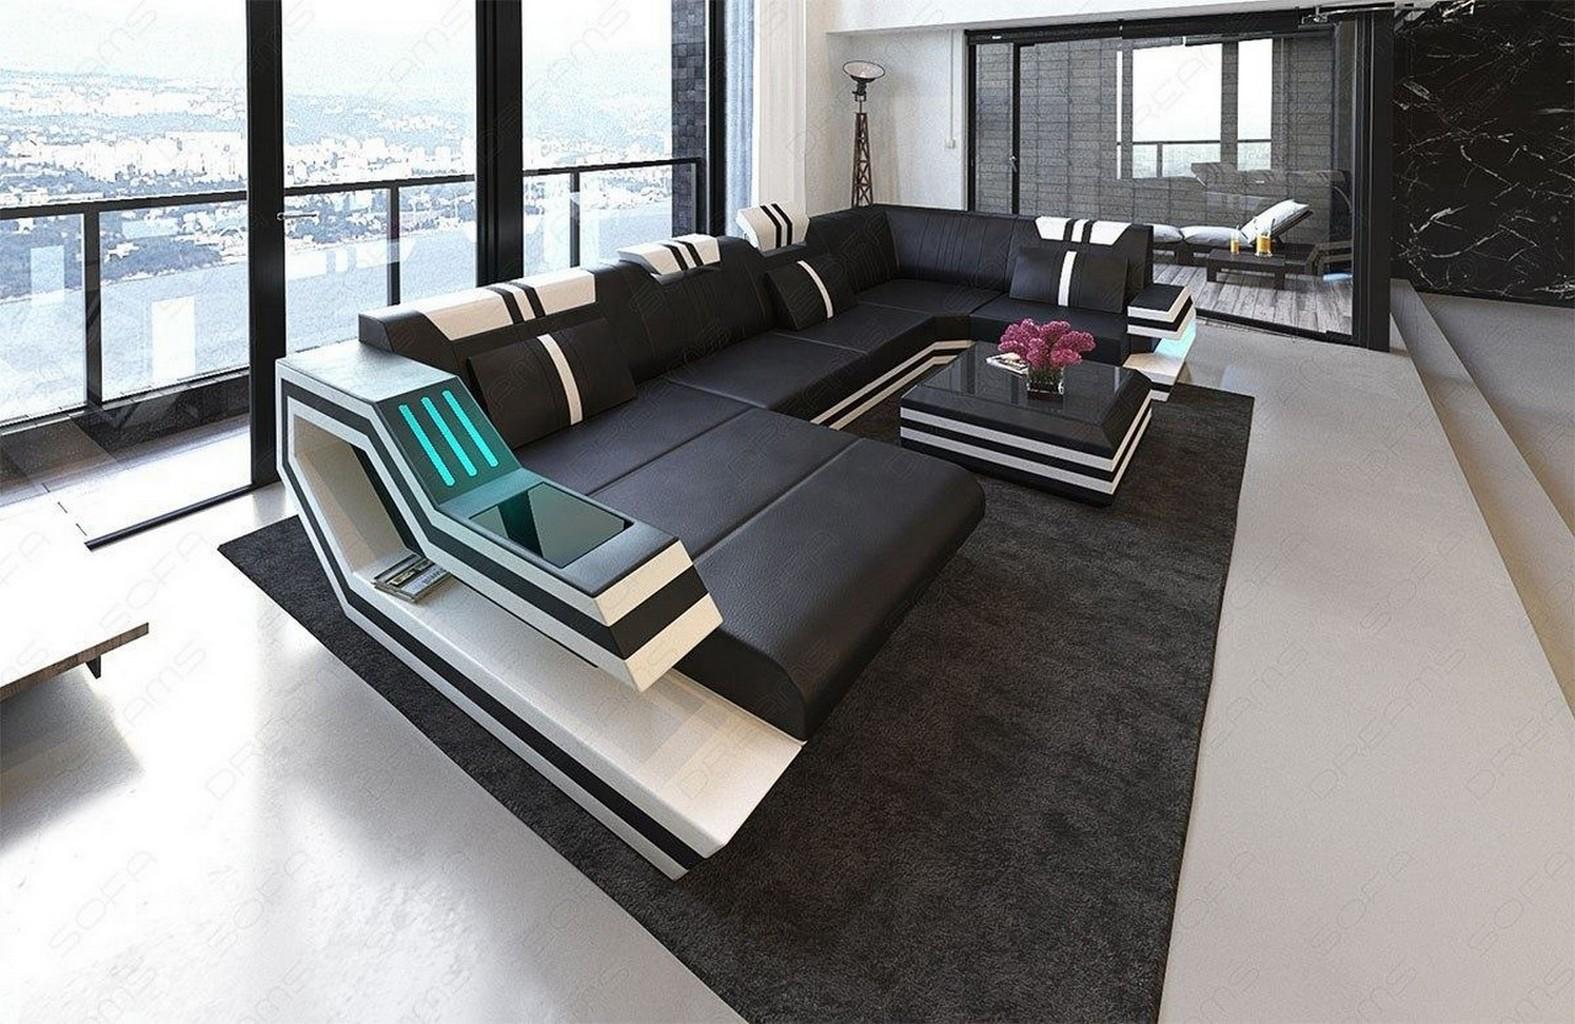 Couch u form  Leather Sectional Sofa RAVENNA U Shape Corner Sofa + LED Lights ...